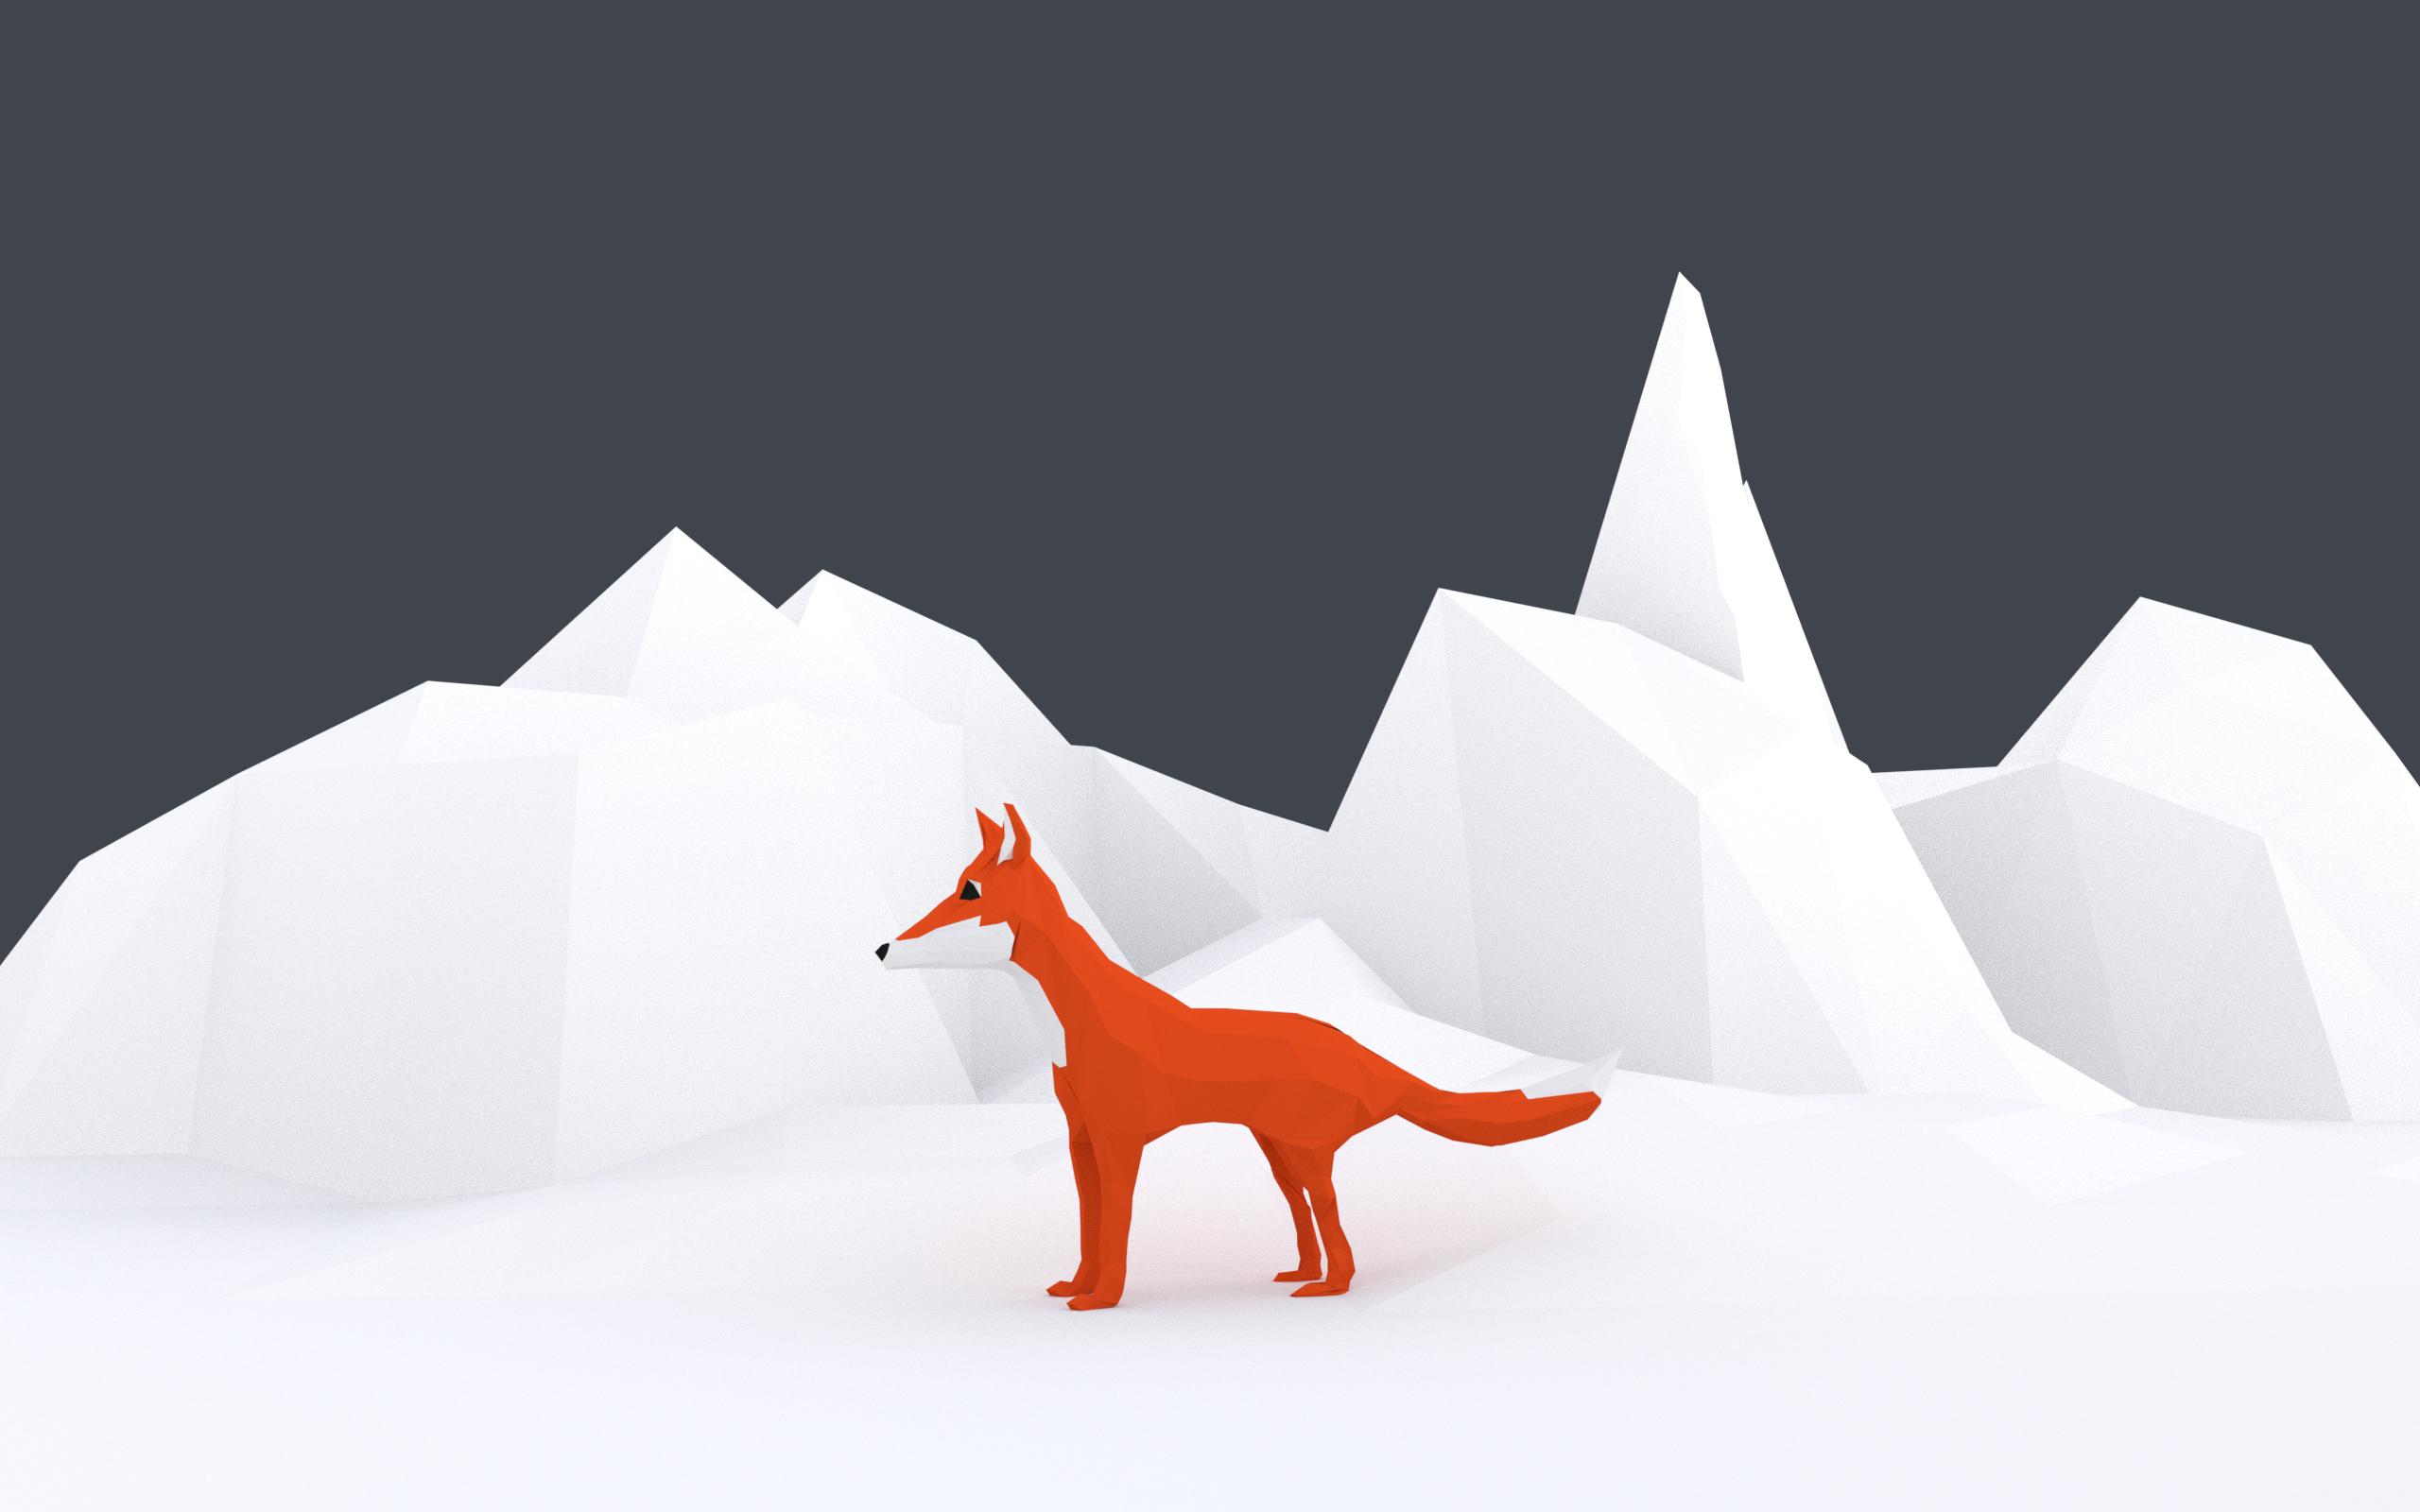 WIP - Low Poly Fox